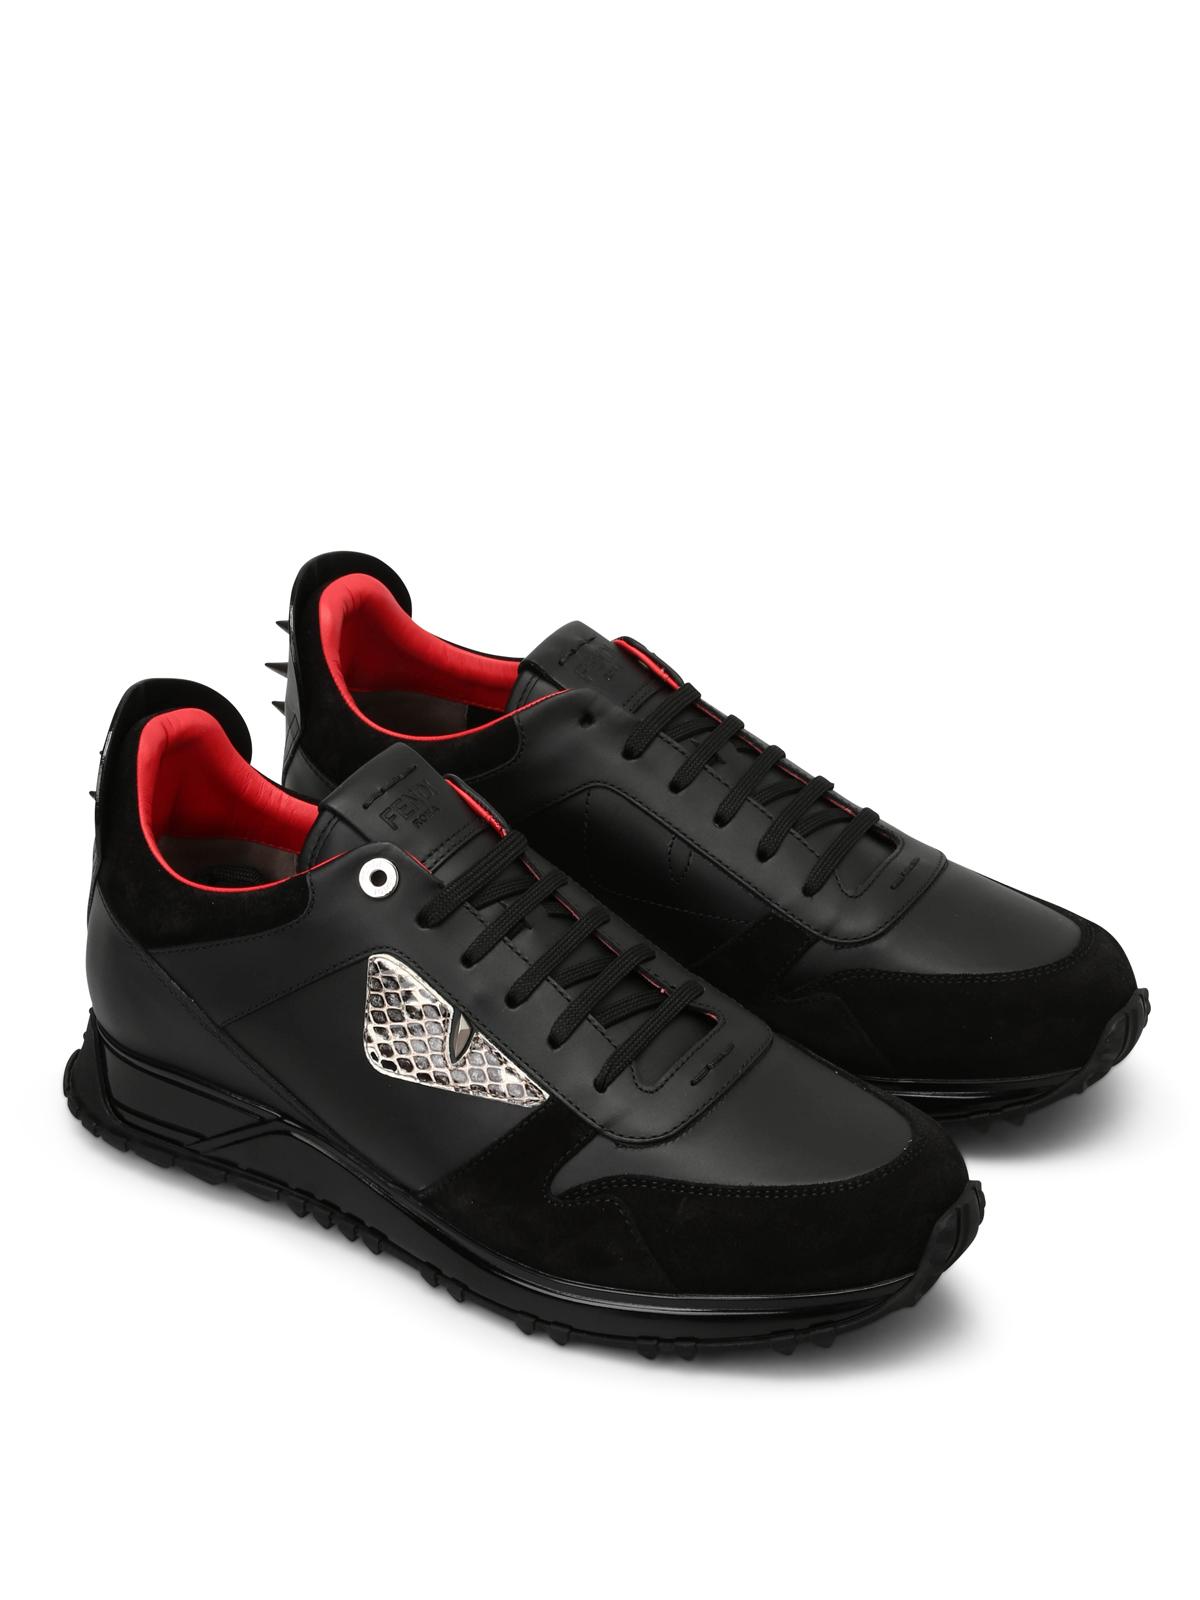 Fendi - Bag Bugs leather sneakers - trainers - 7E093692E F06BP ... 8b5bc086661